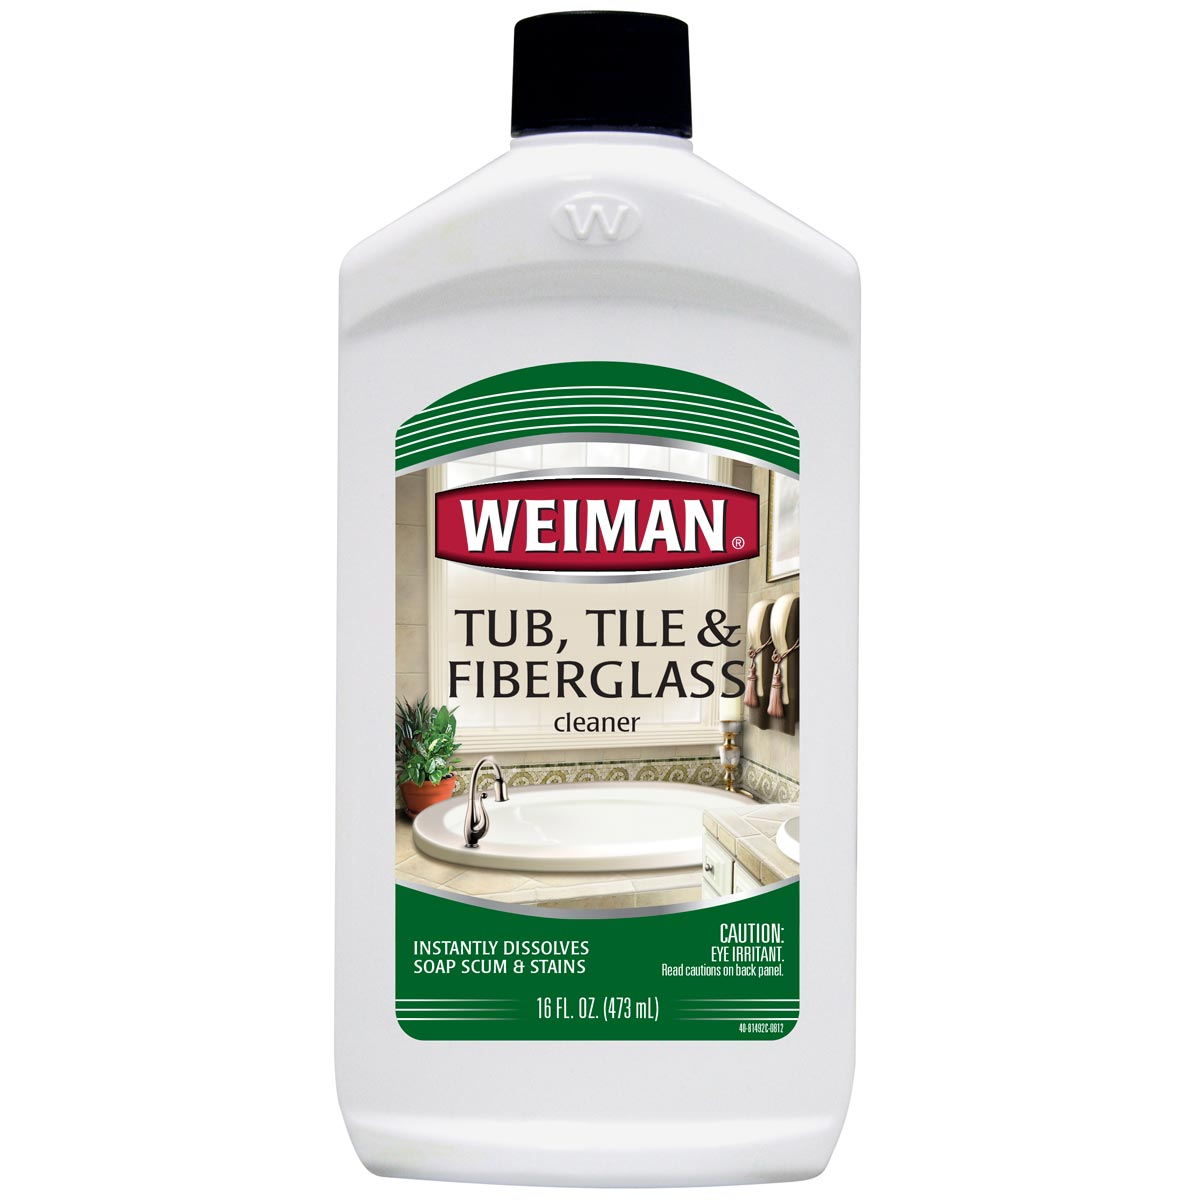 Tub and fiberglass cleaner